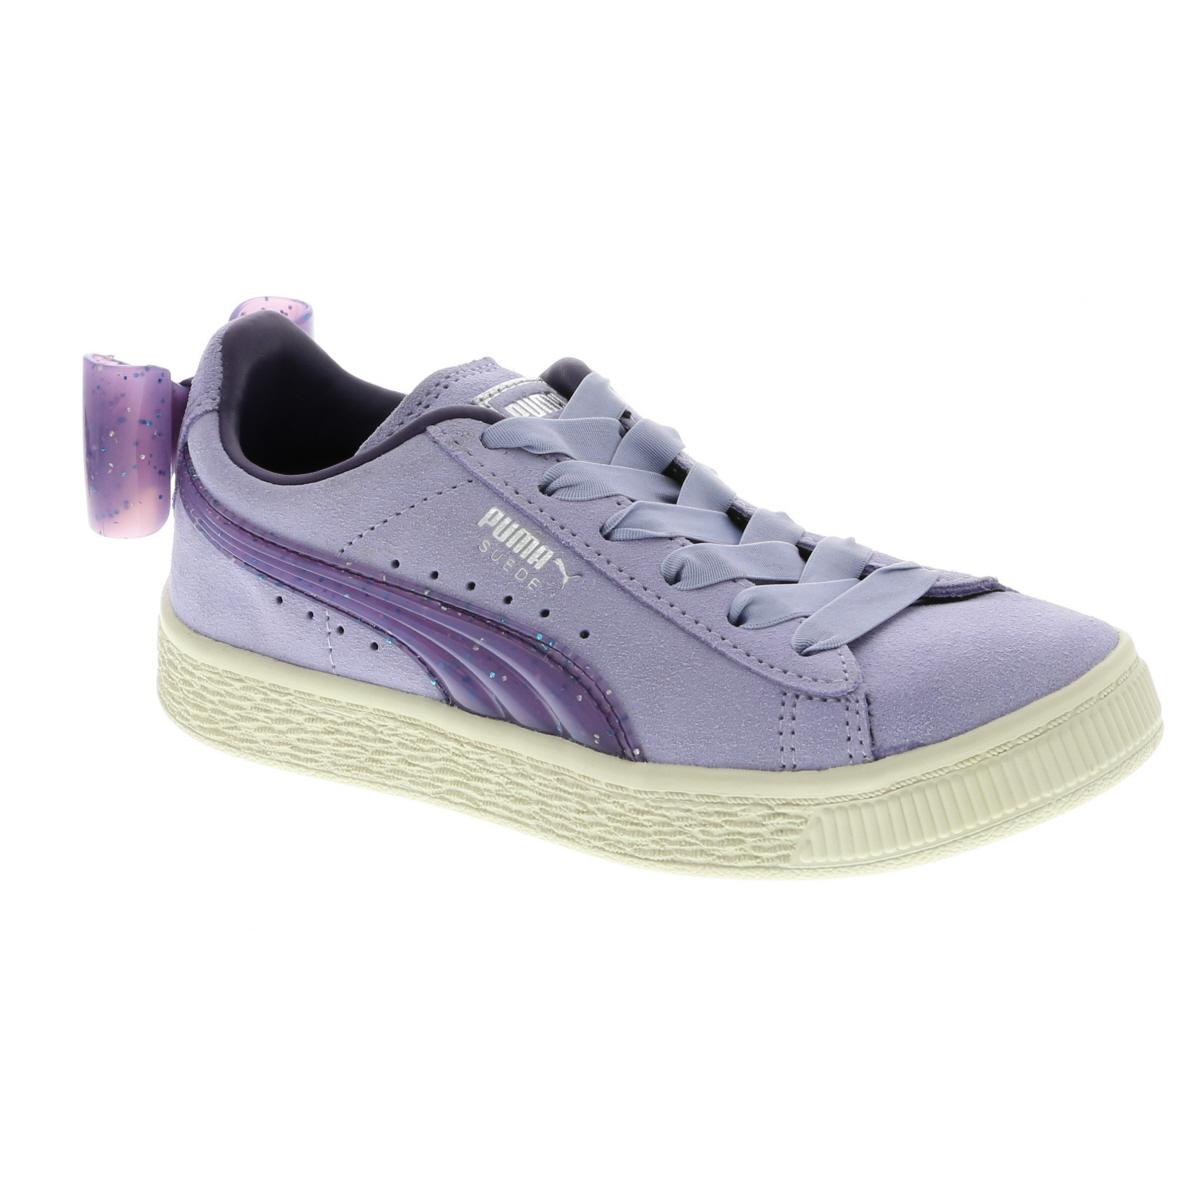 ff13fa37e92 Puma sneakers bestel je online bij